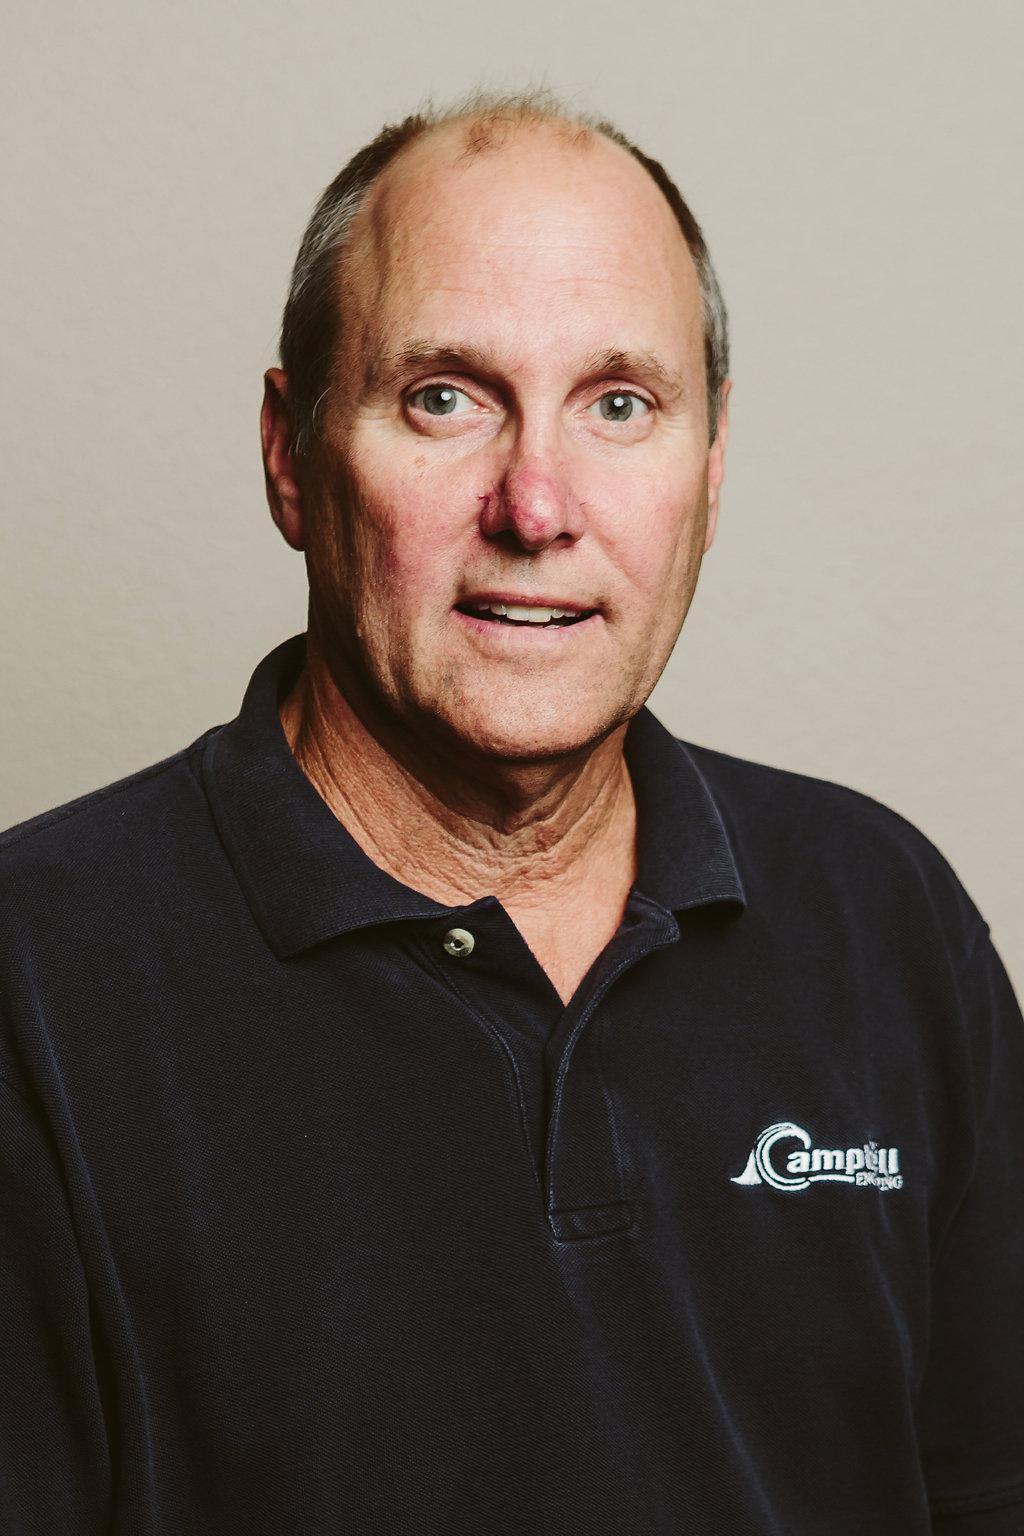 Bob Lynch - Sales/Purchasing